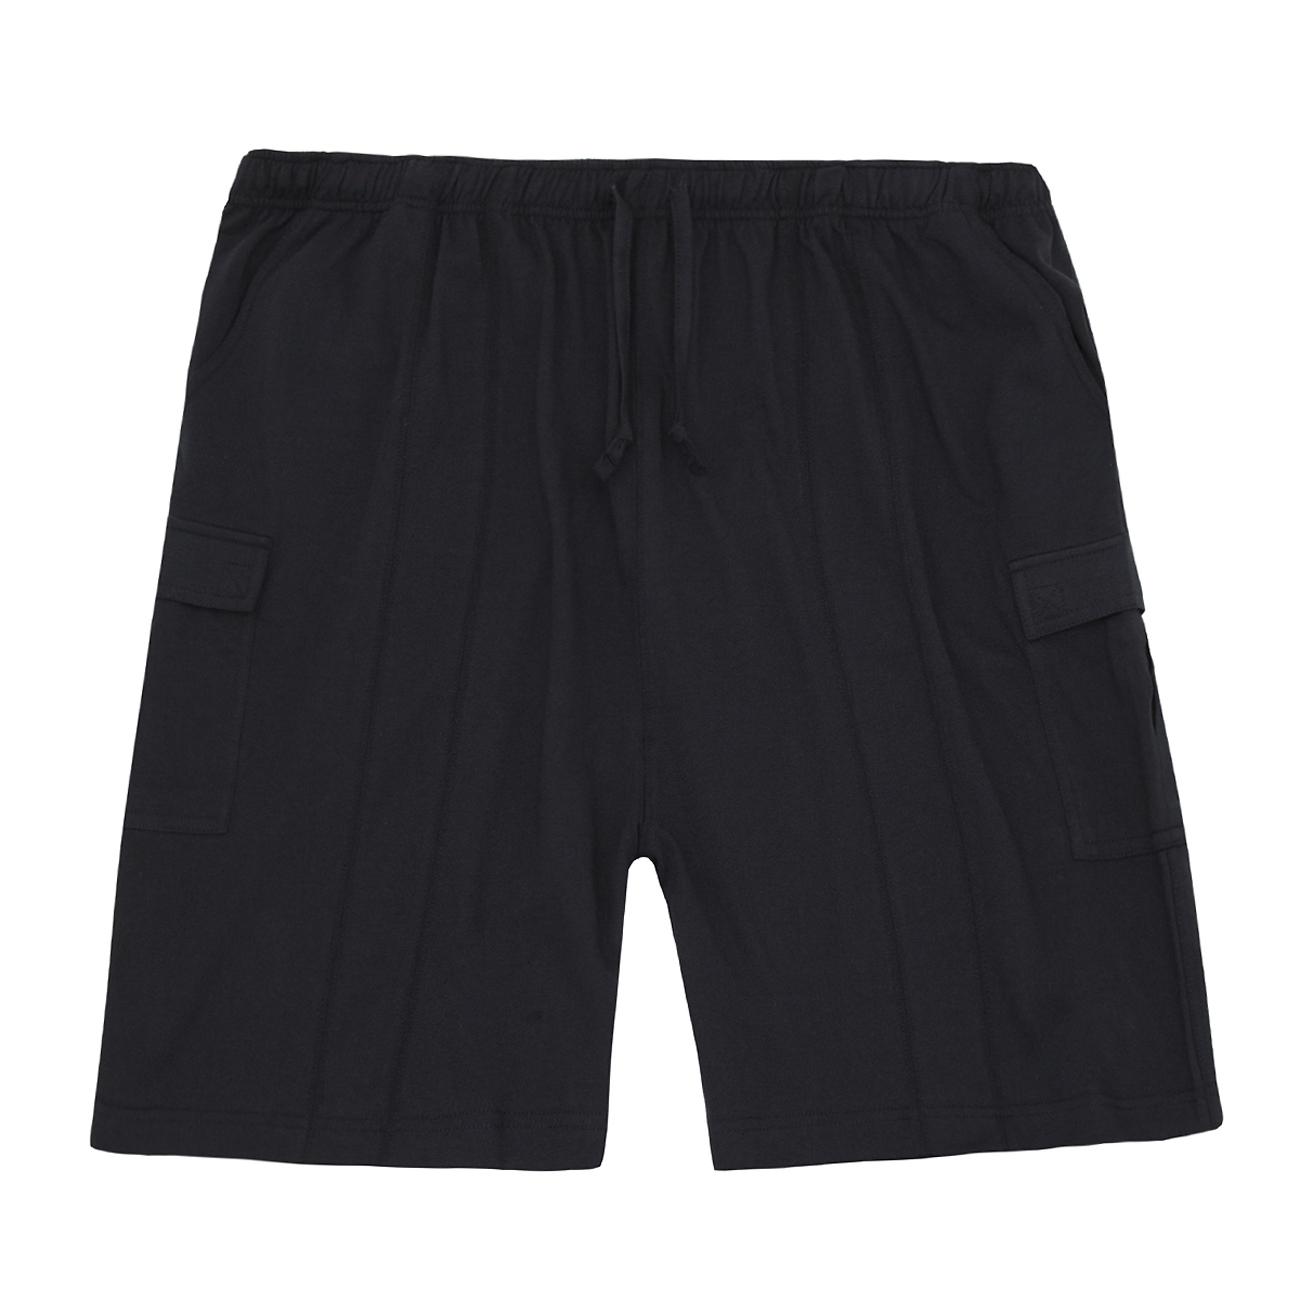 DRSLPAR Mens Casual Plaid Shorts Big and Tall Cargo Shorts Drawstring with Blue